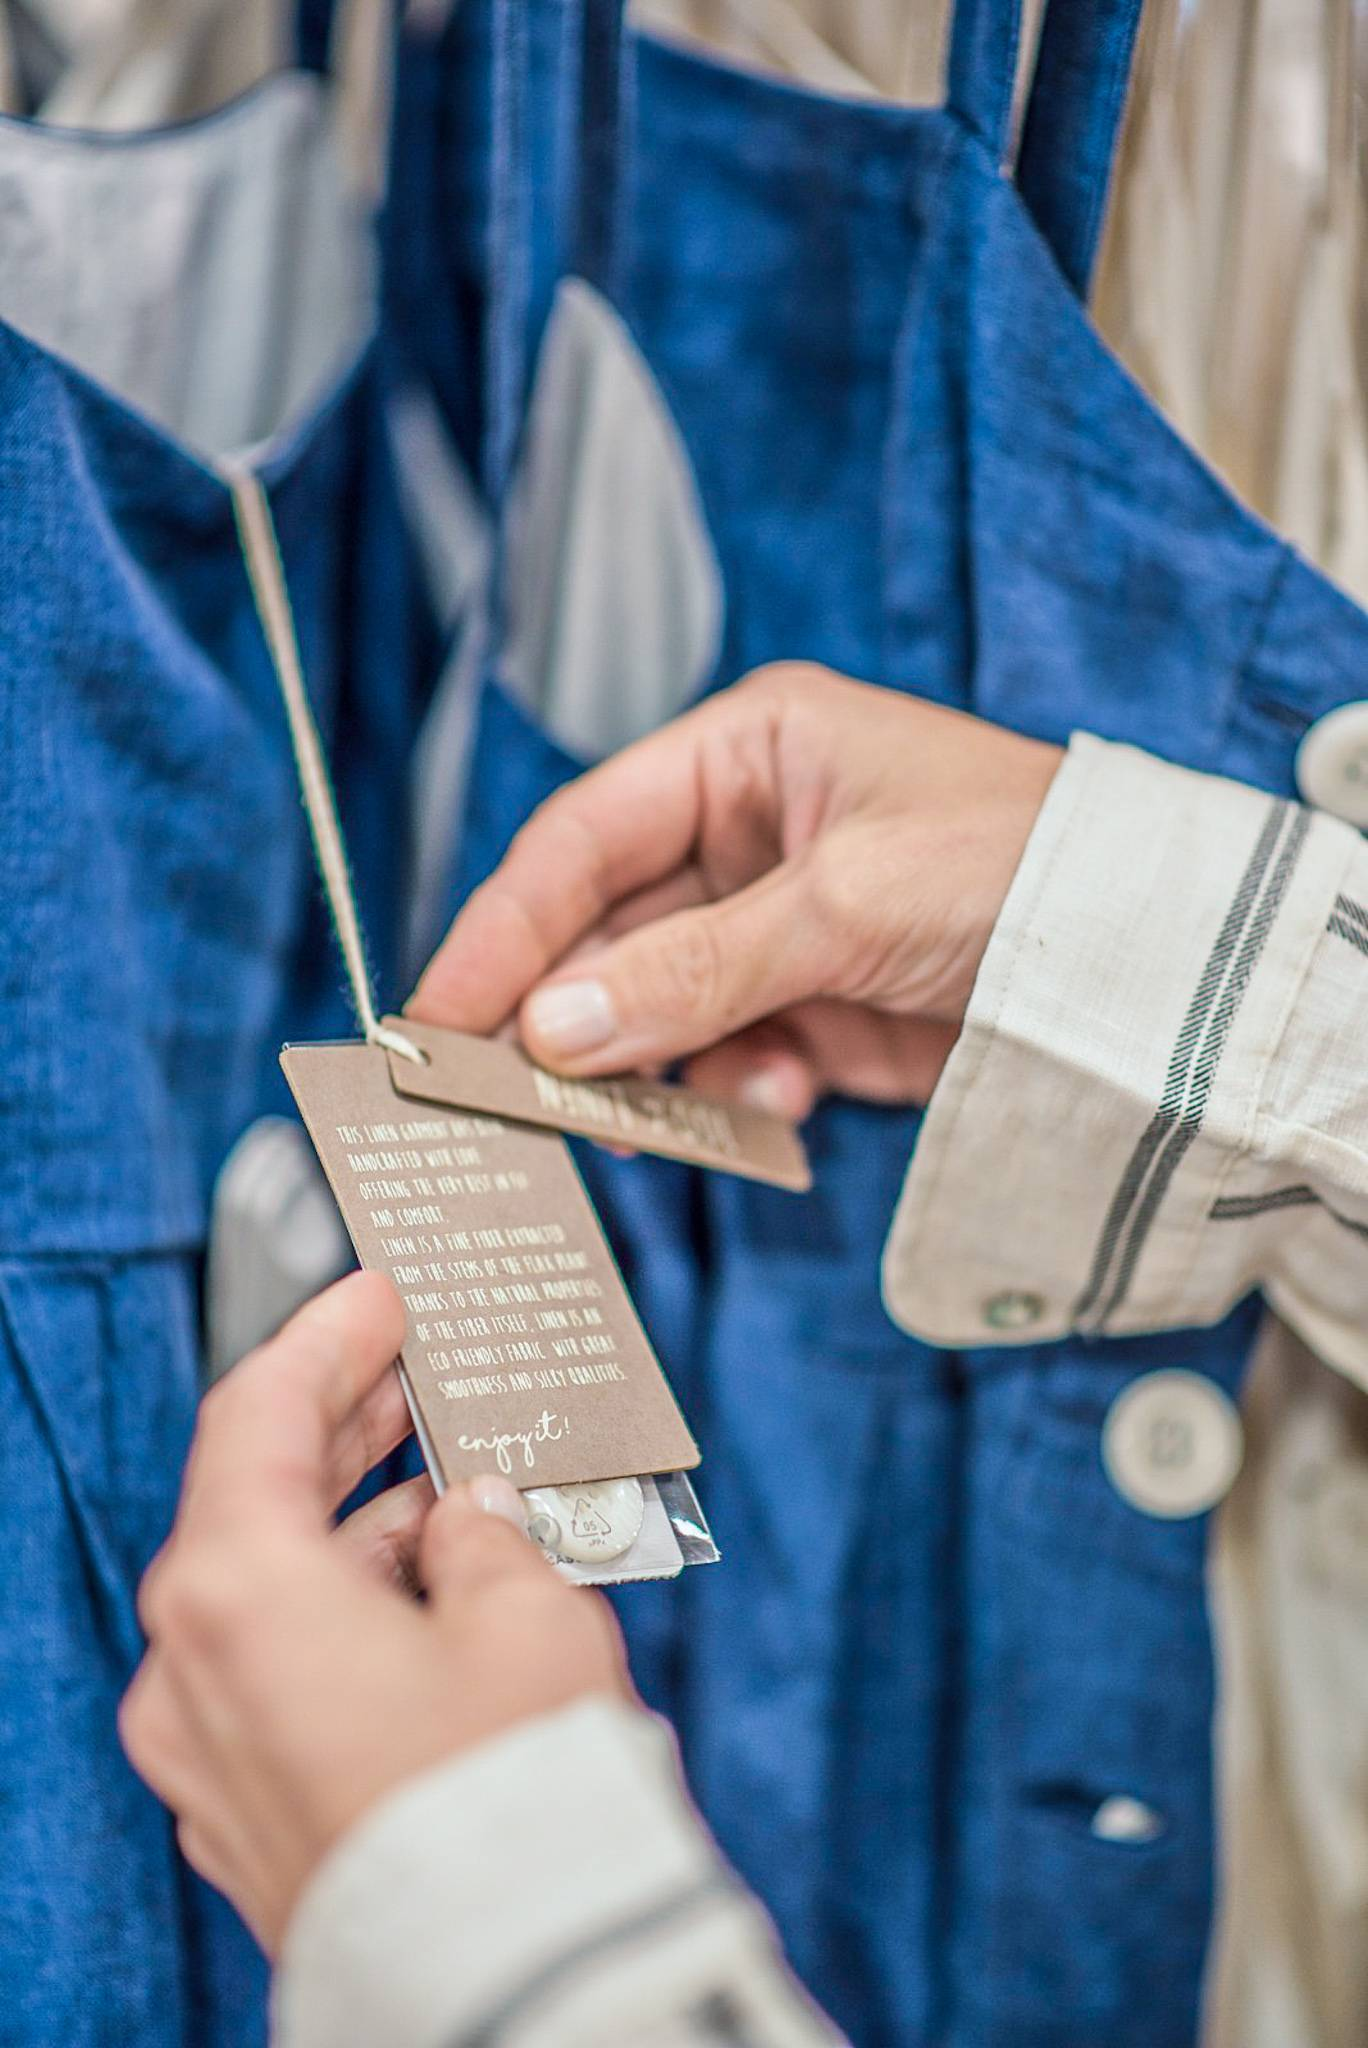 gestion de la abundancia fast fashion moda contaminante basiklife